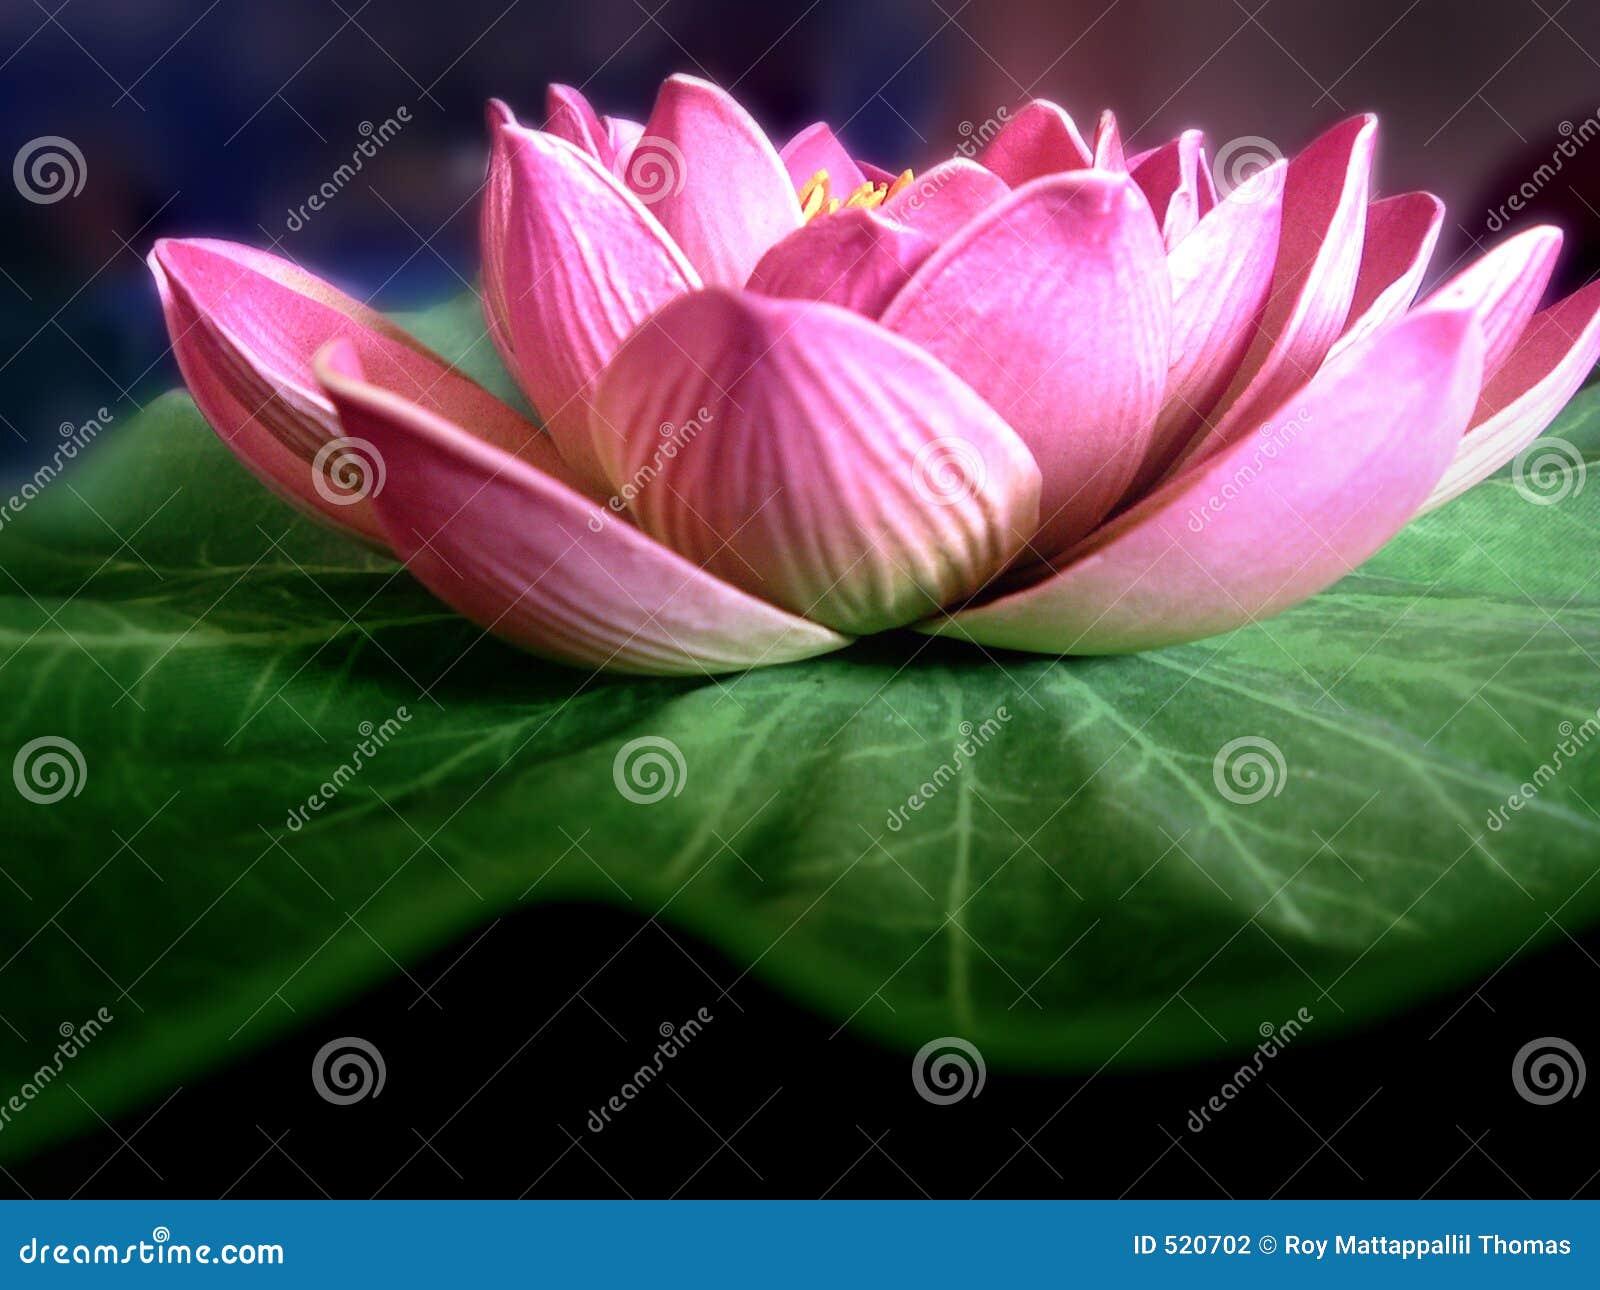 Lotus Flower Stock Photography Image 520702